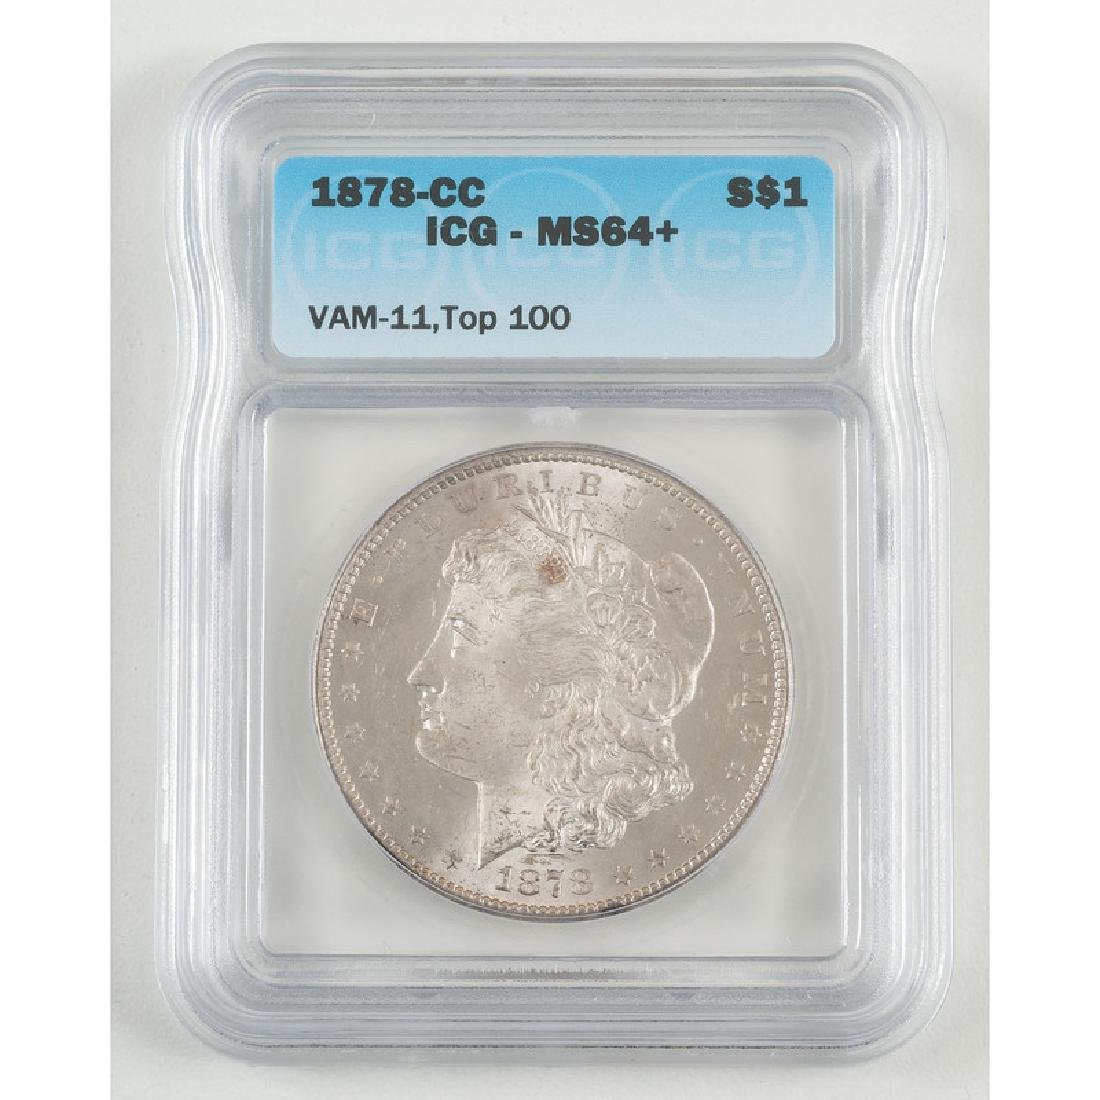 United States Morgan Silver Dollar 1878-CC, ICG MS64+